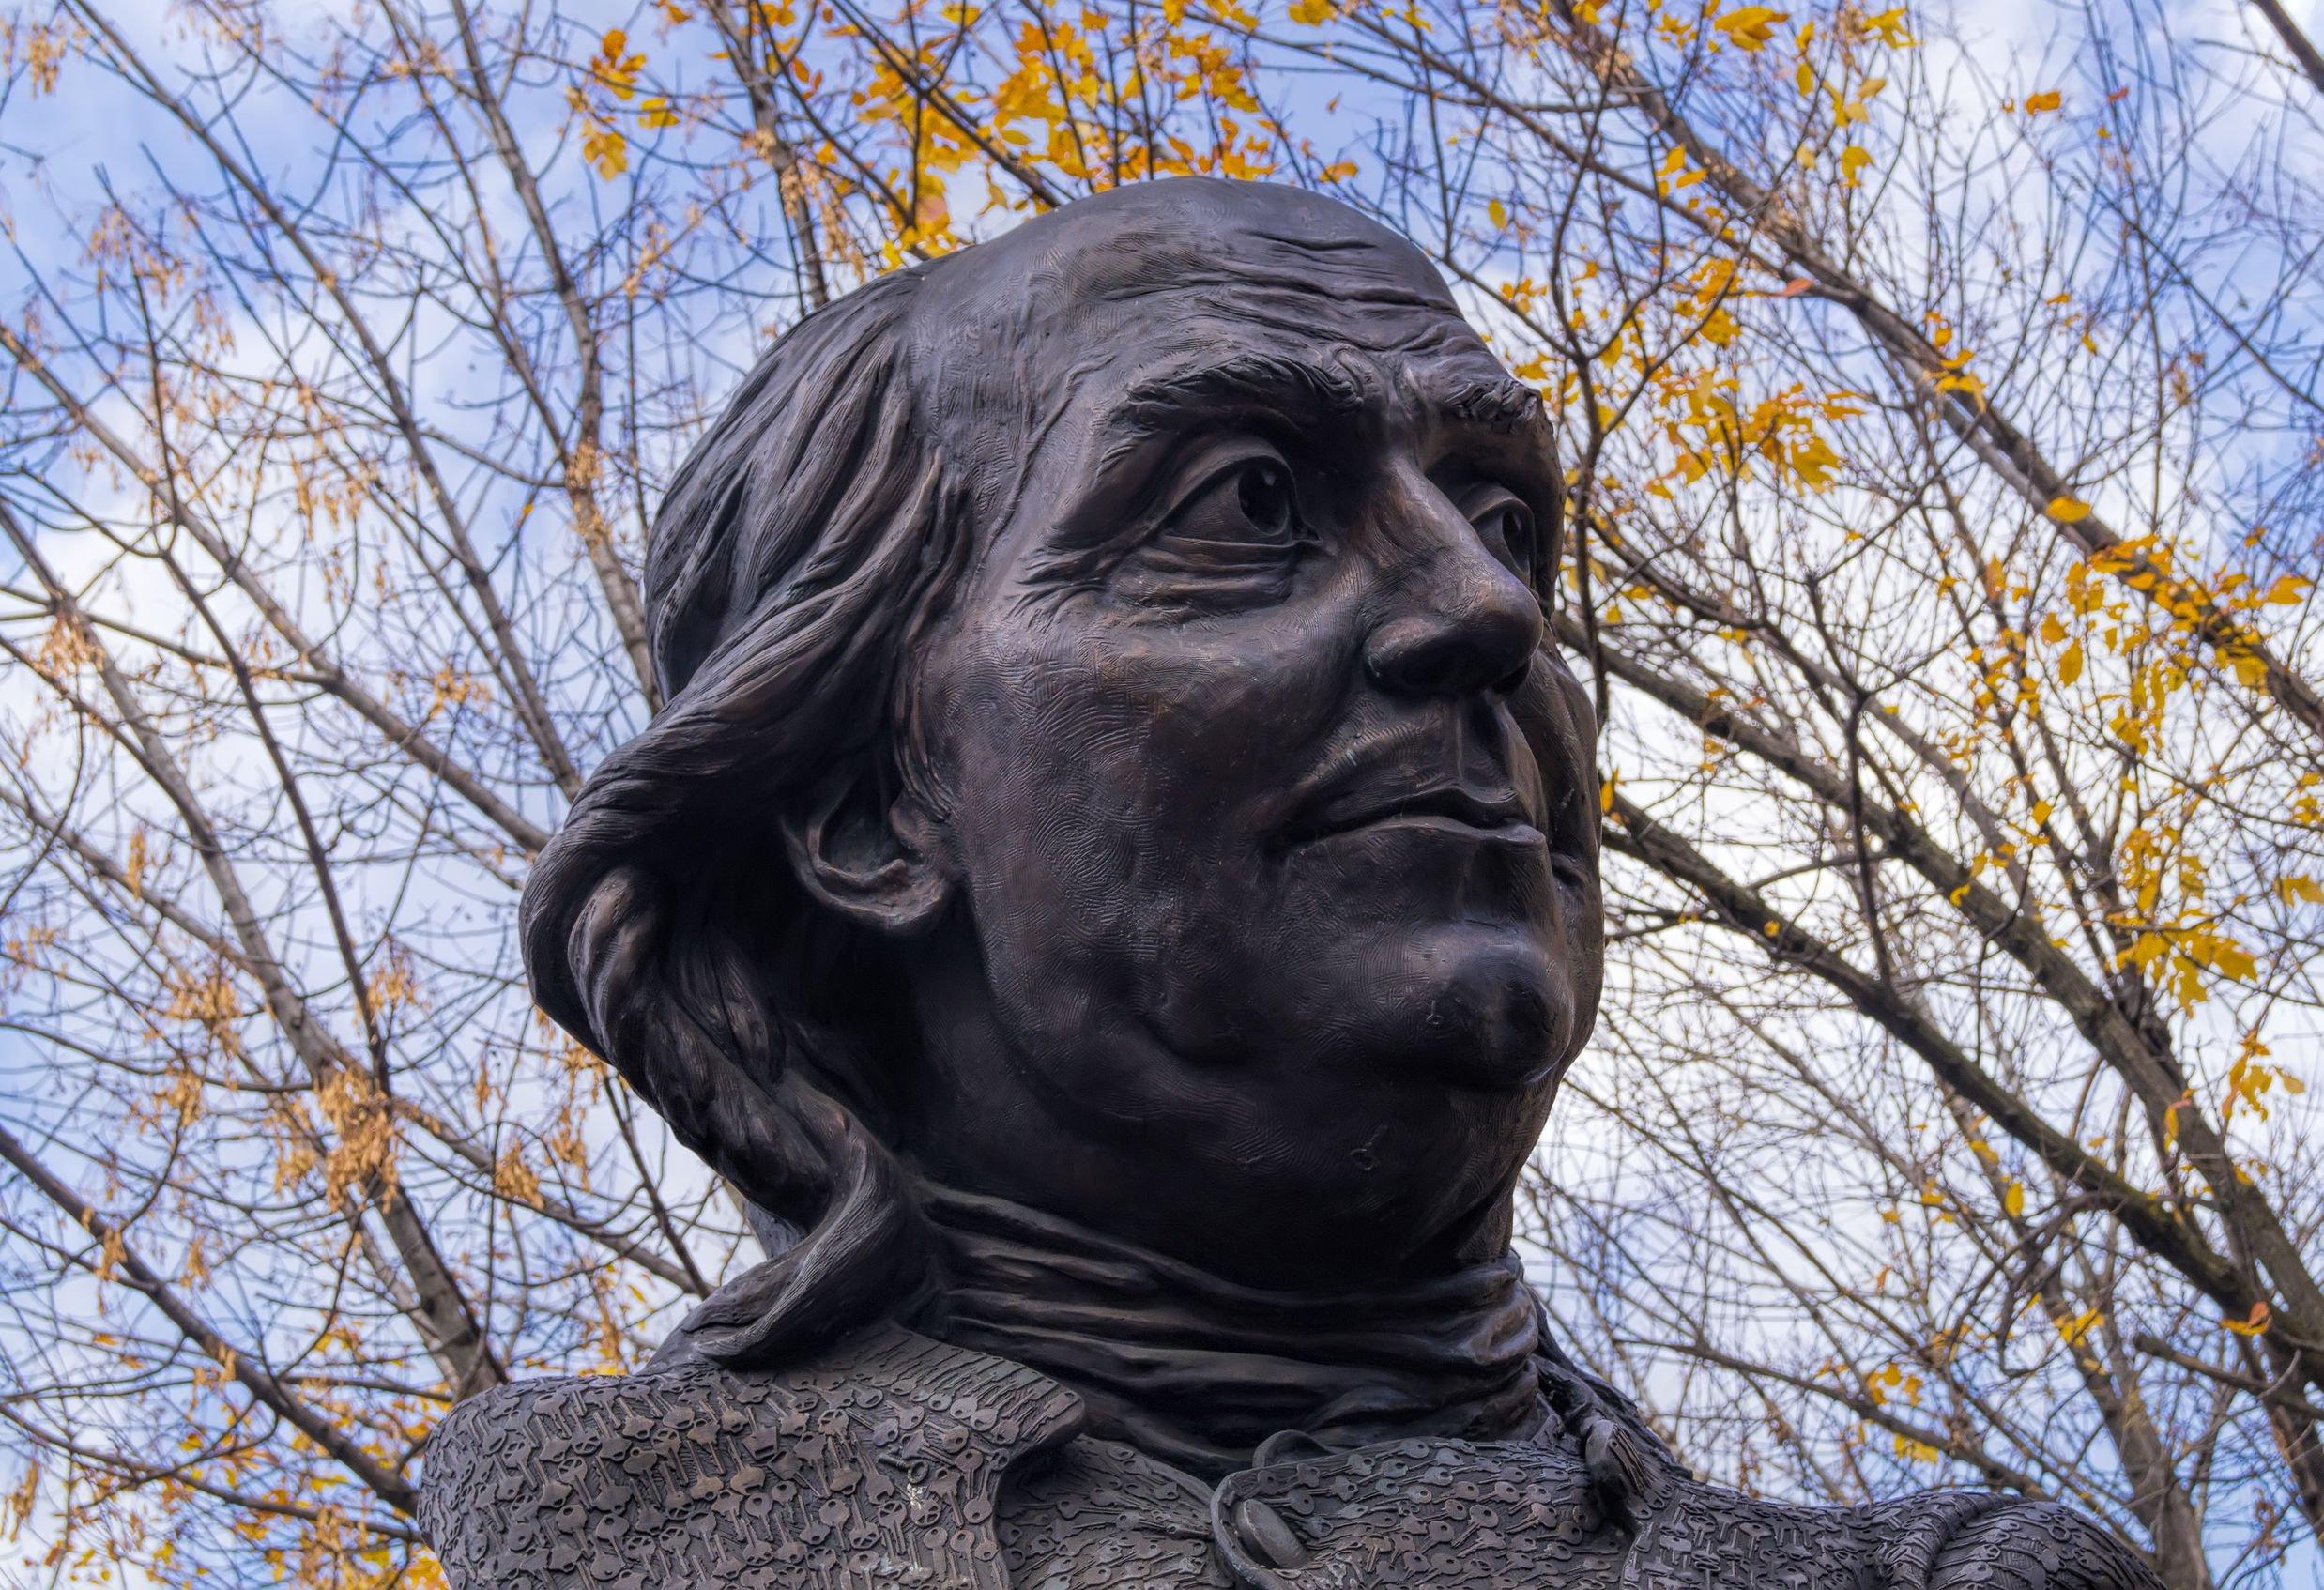 A statue of Ben Franklin